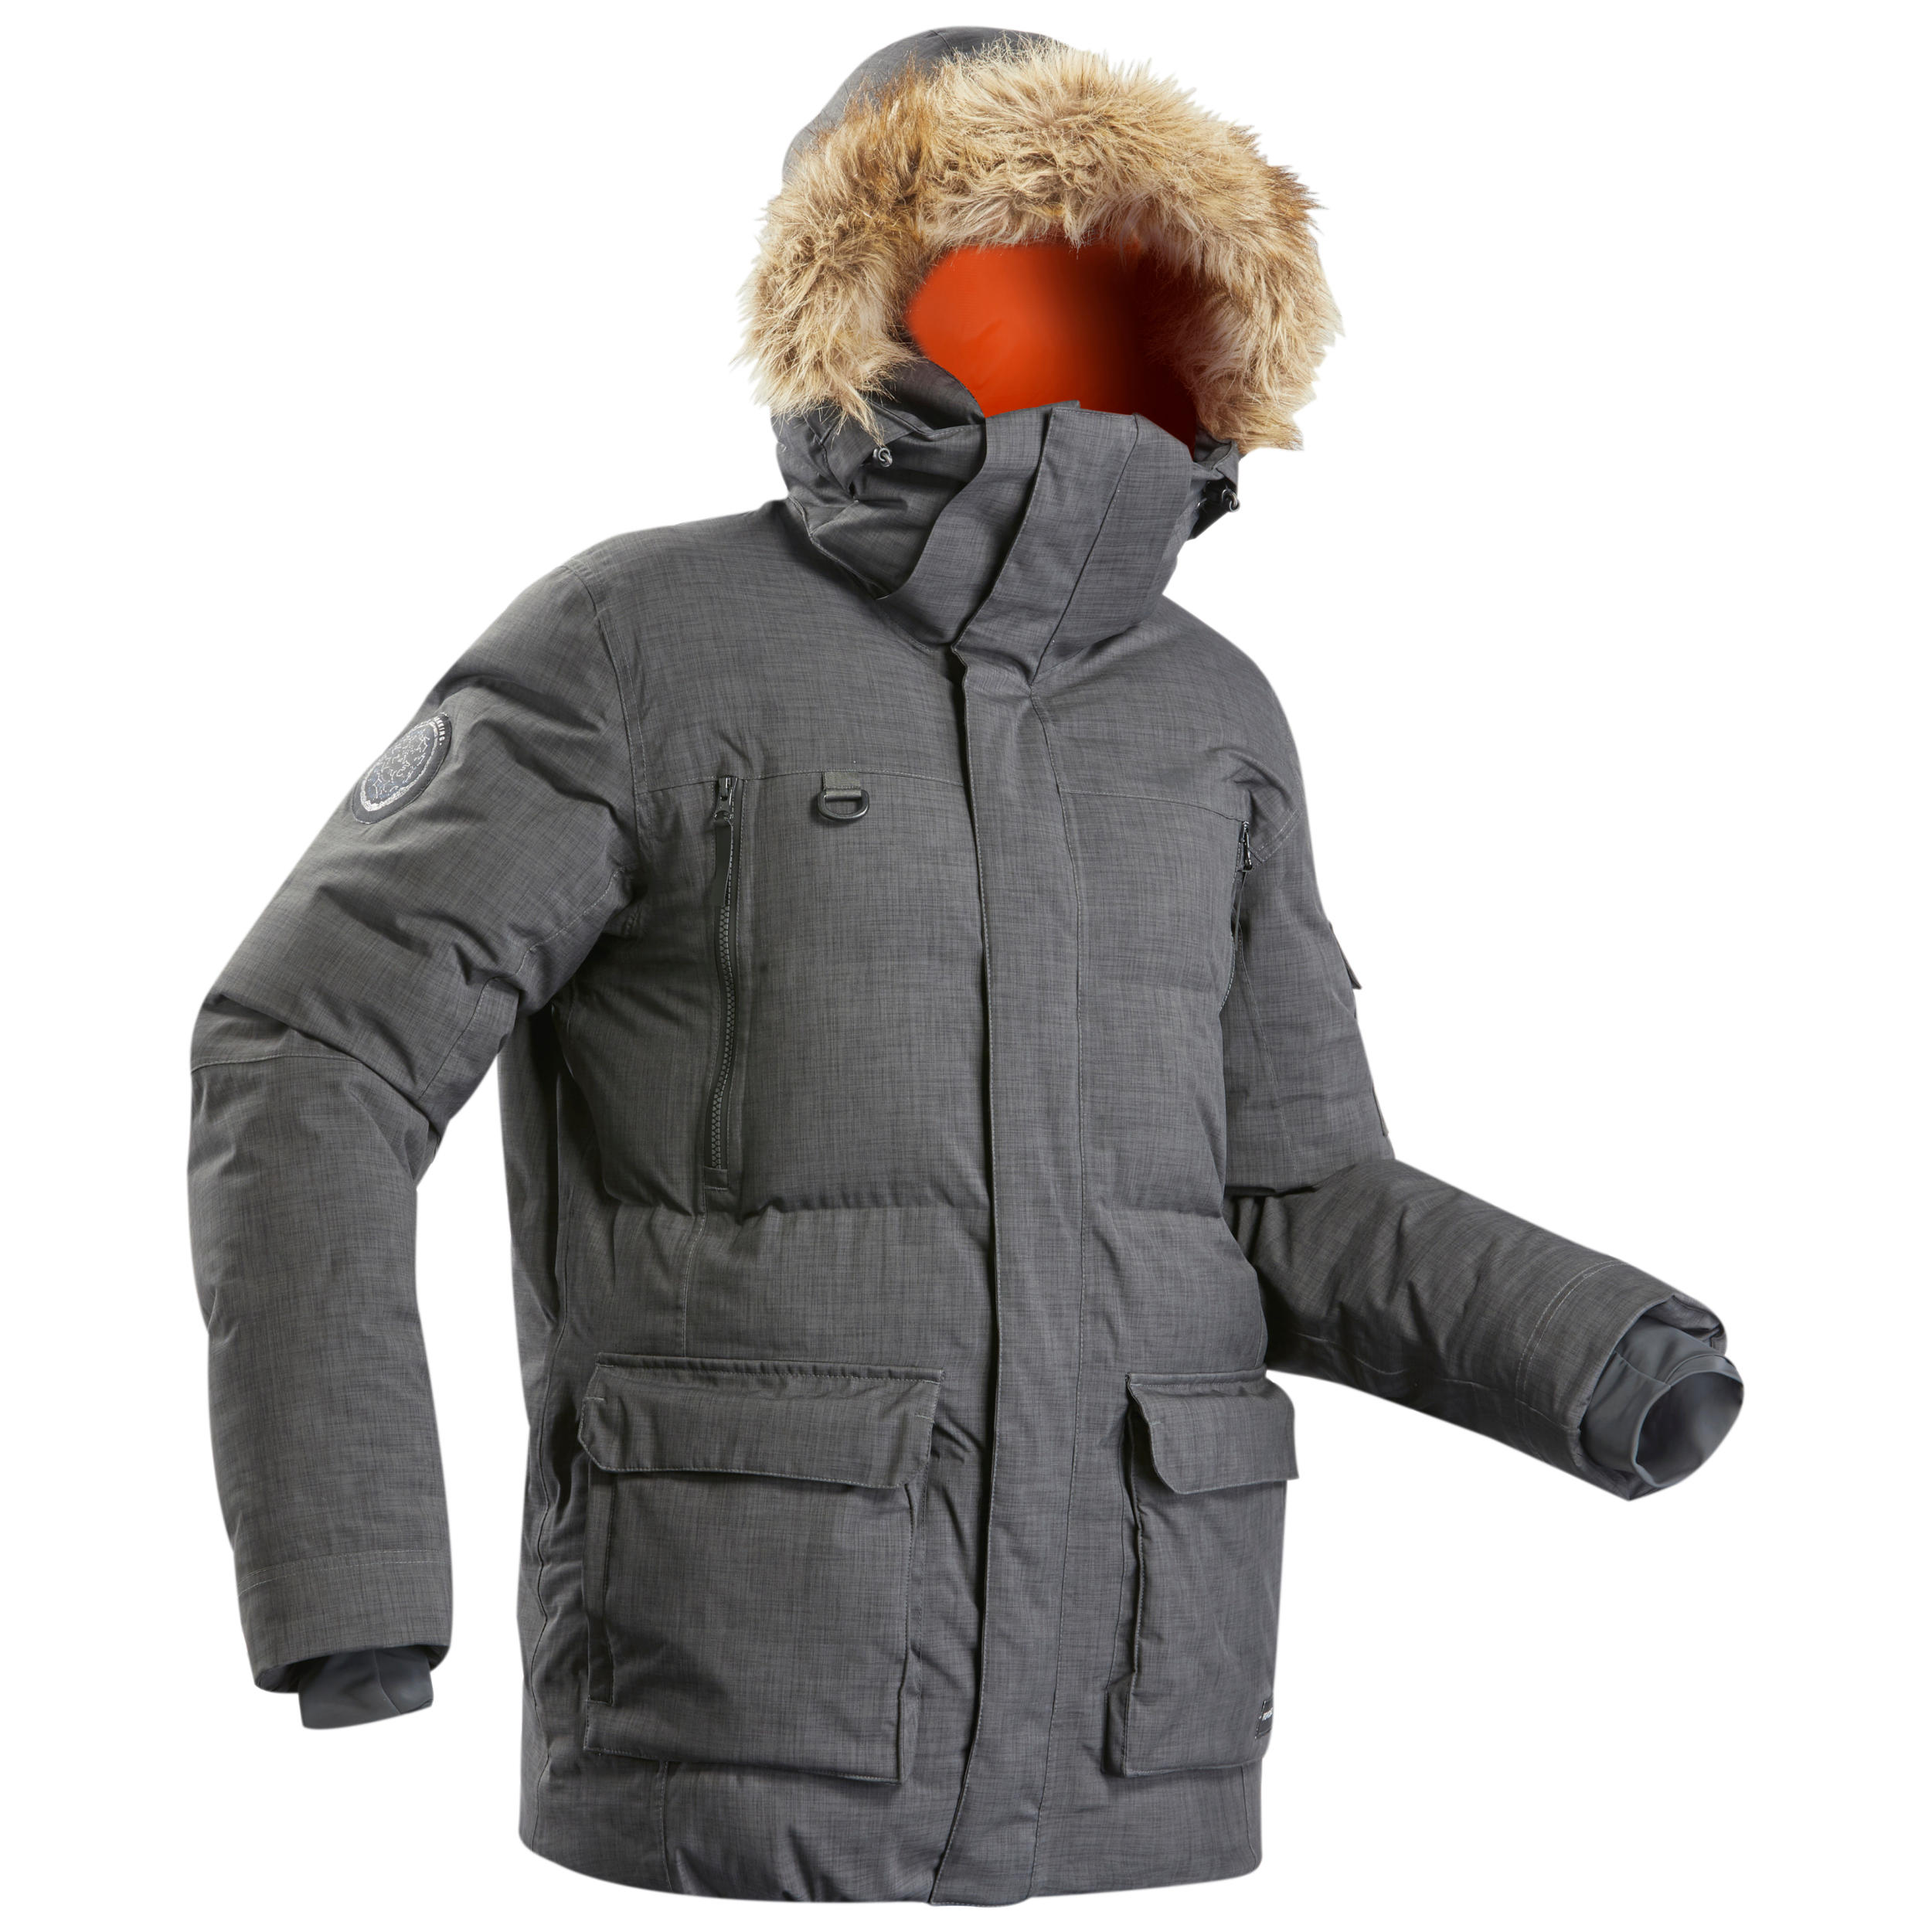 Winter Coat//Jacket New! Arctic Trek 3-in-1 Hooded Parka w// Inner Fleece Lining